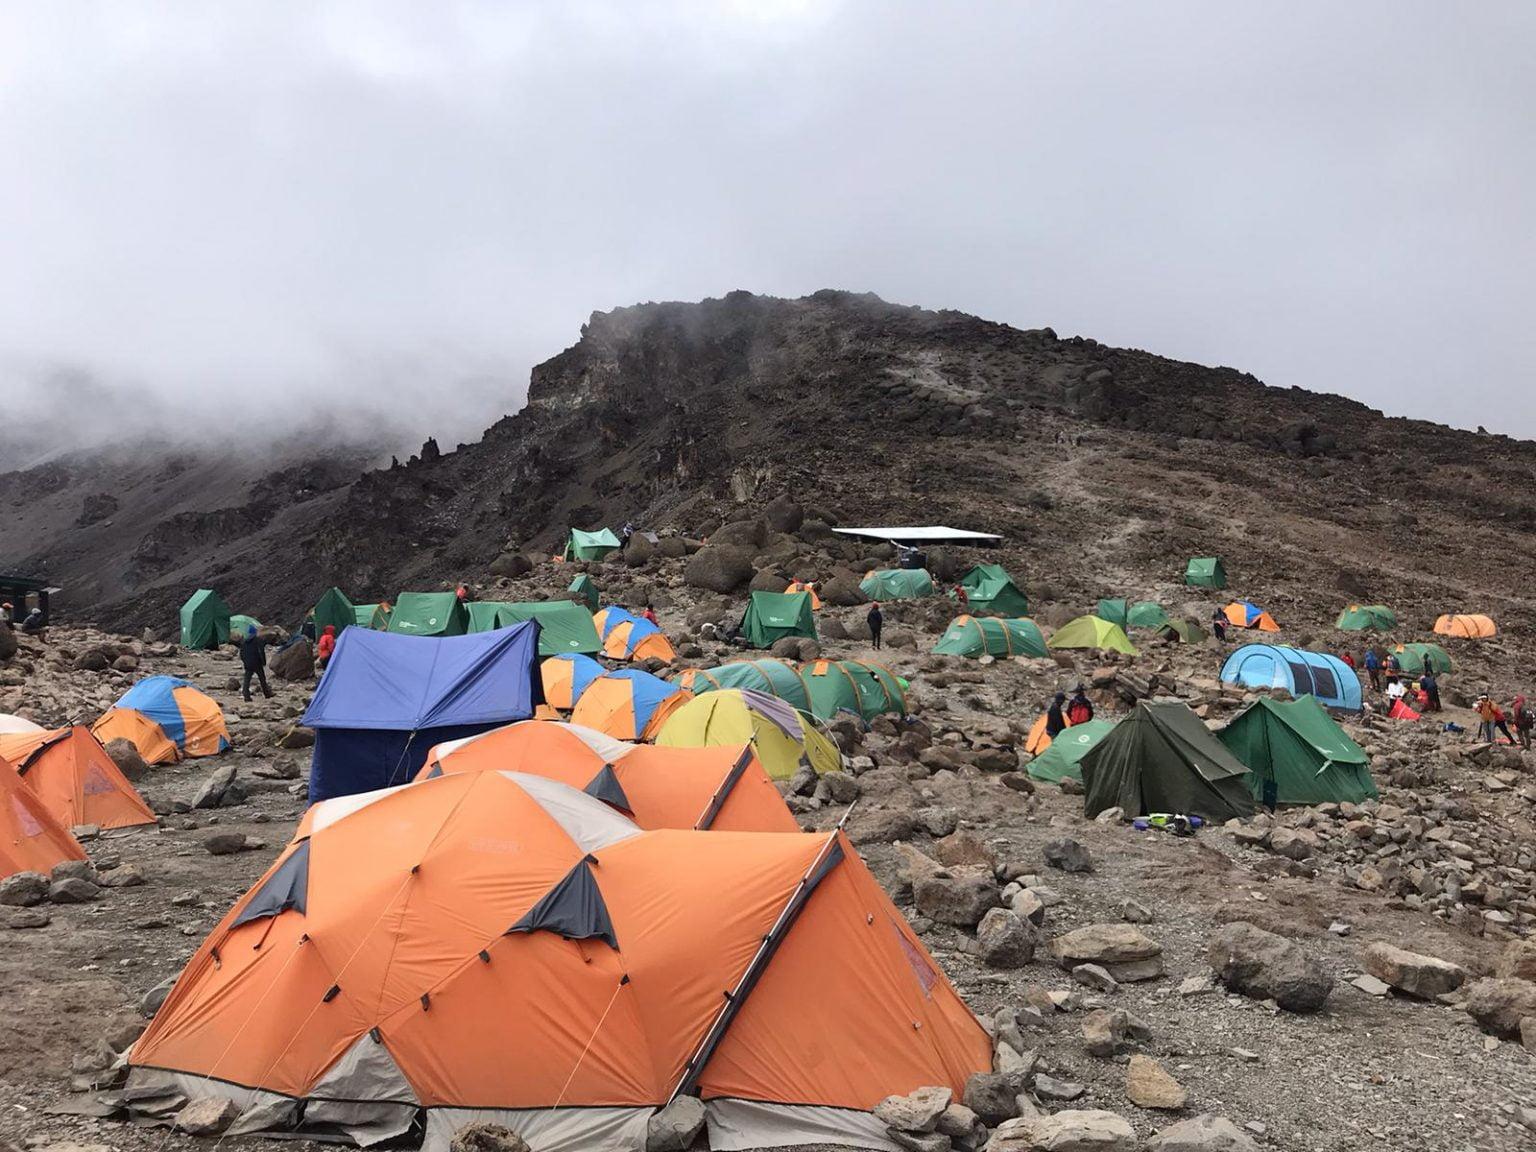 Baranco Camp, Mount Kilimanjaro, Tanzania